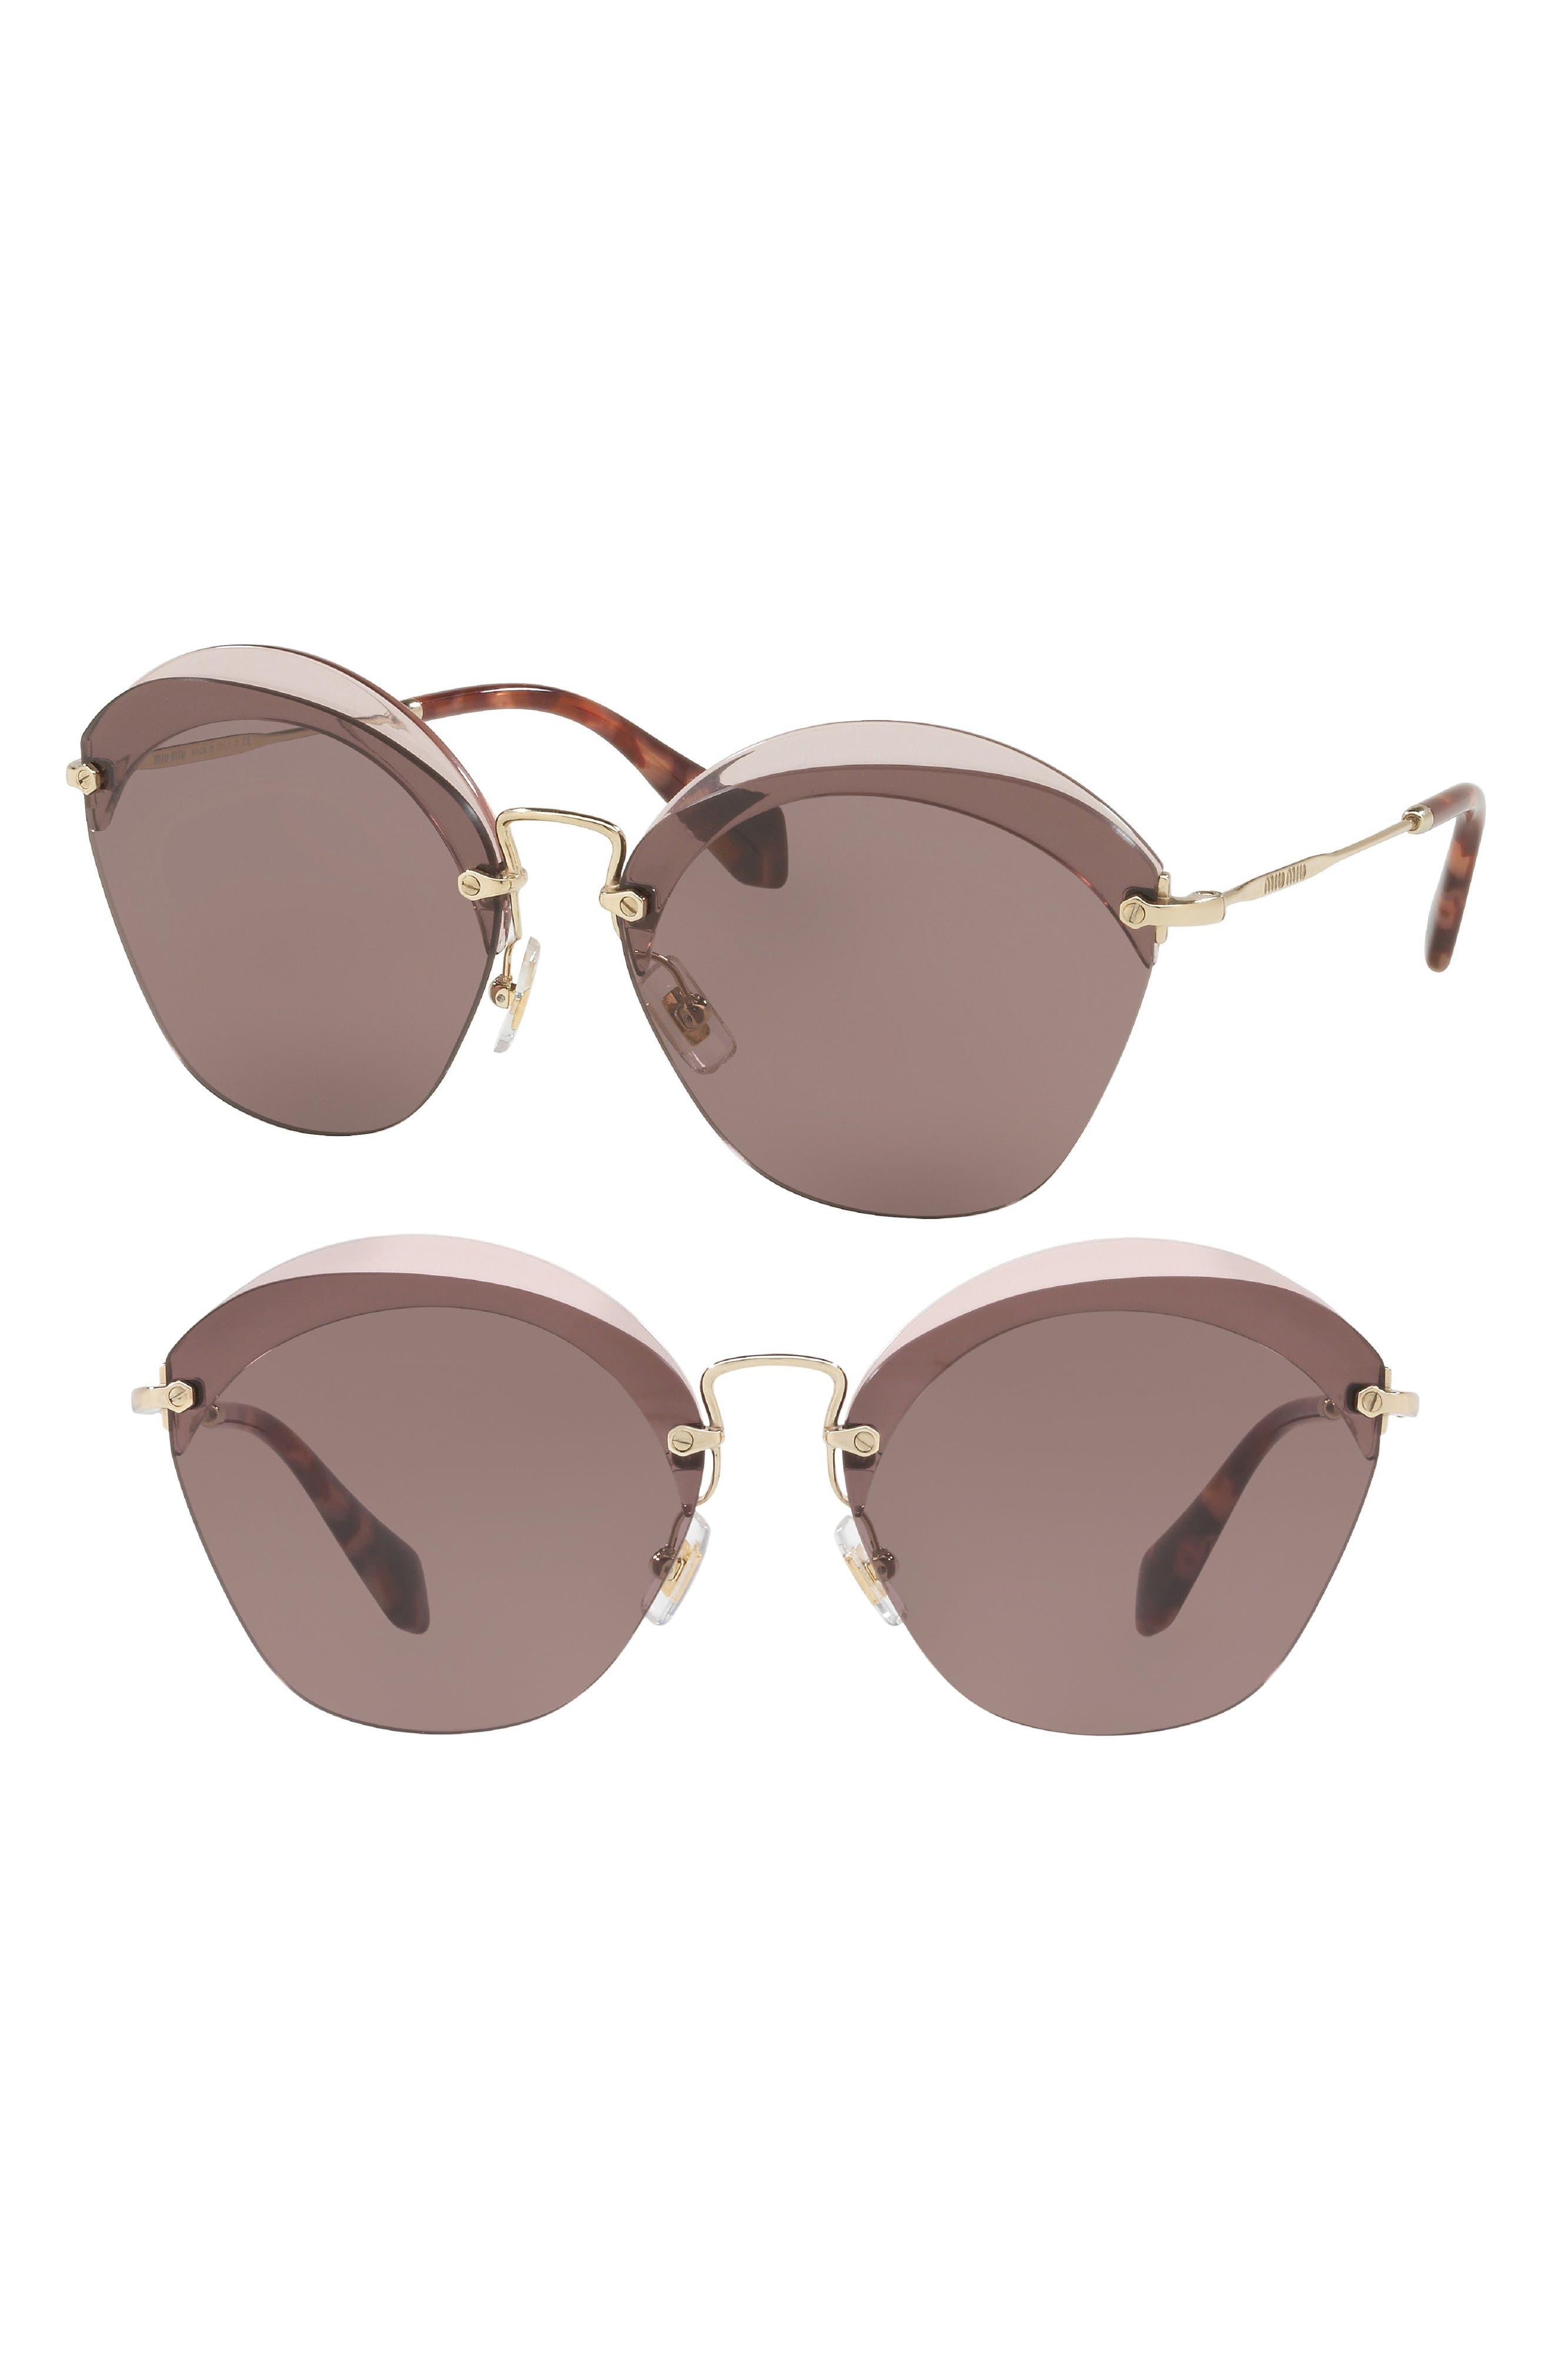 Miu Miu 62mm Sunglasses